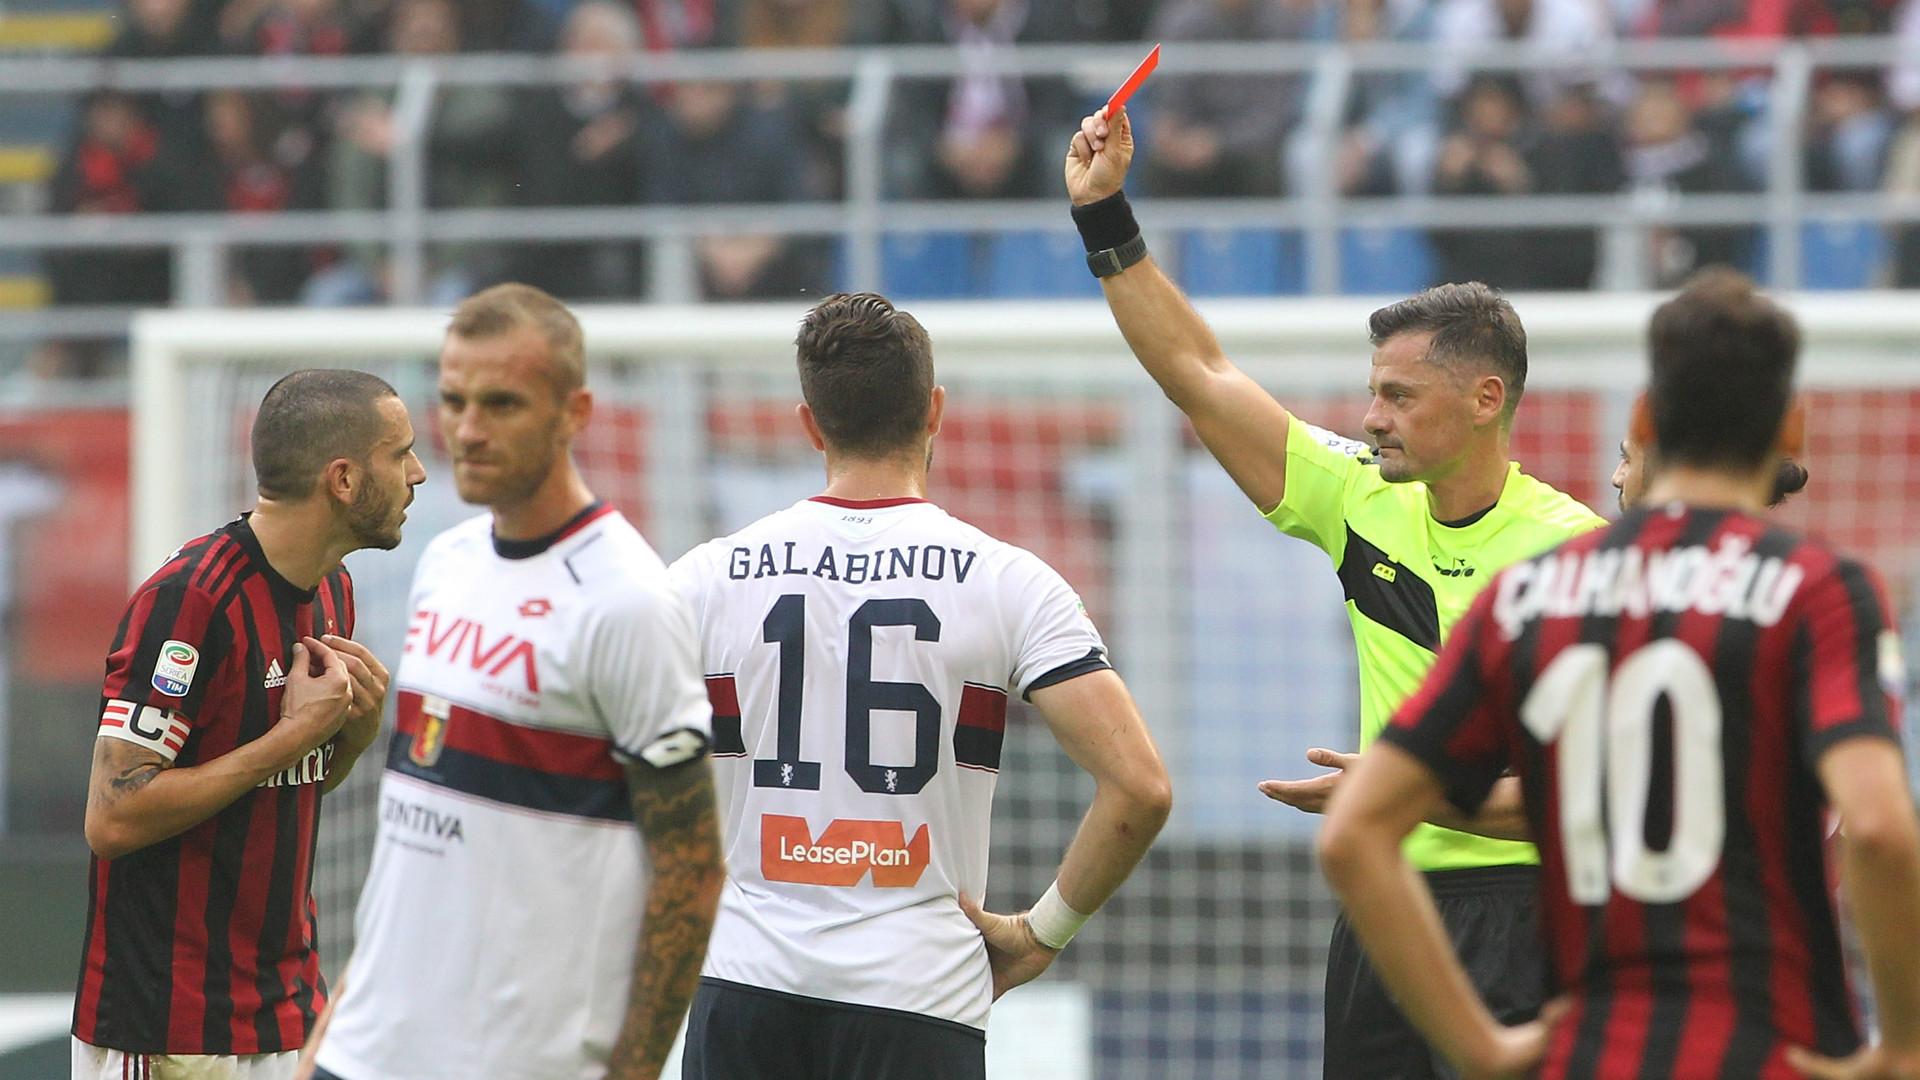 Leonardo Bonucci Milan defender sent off for nasty elbow on